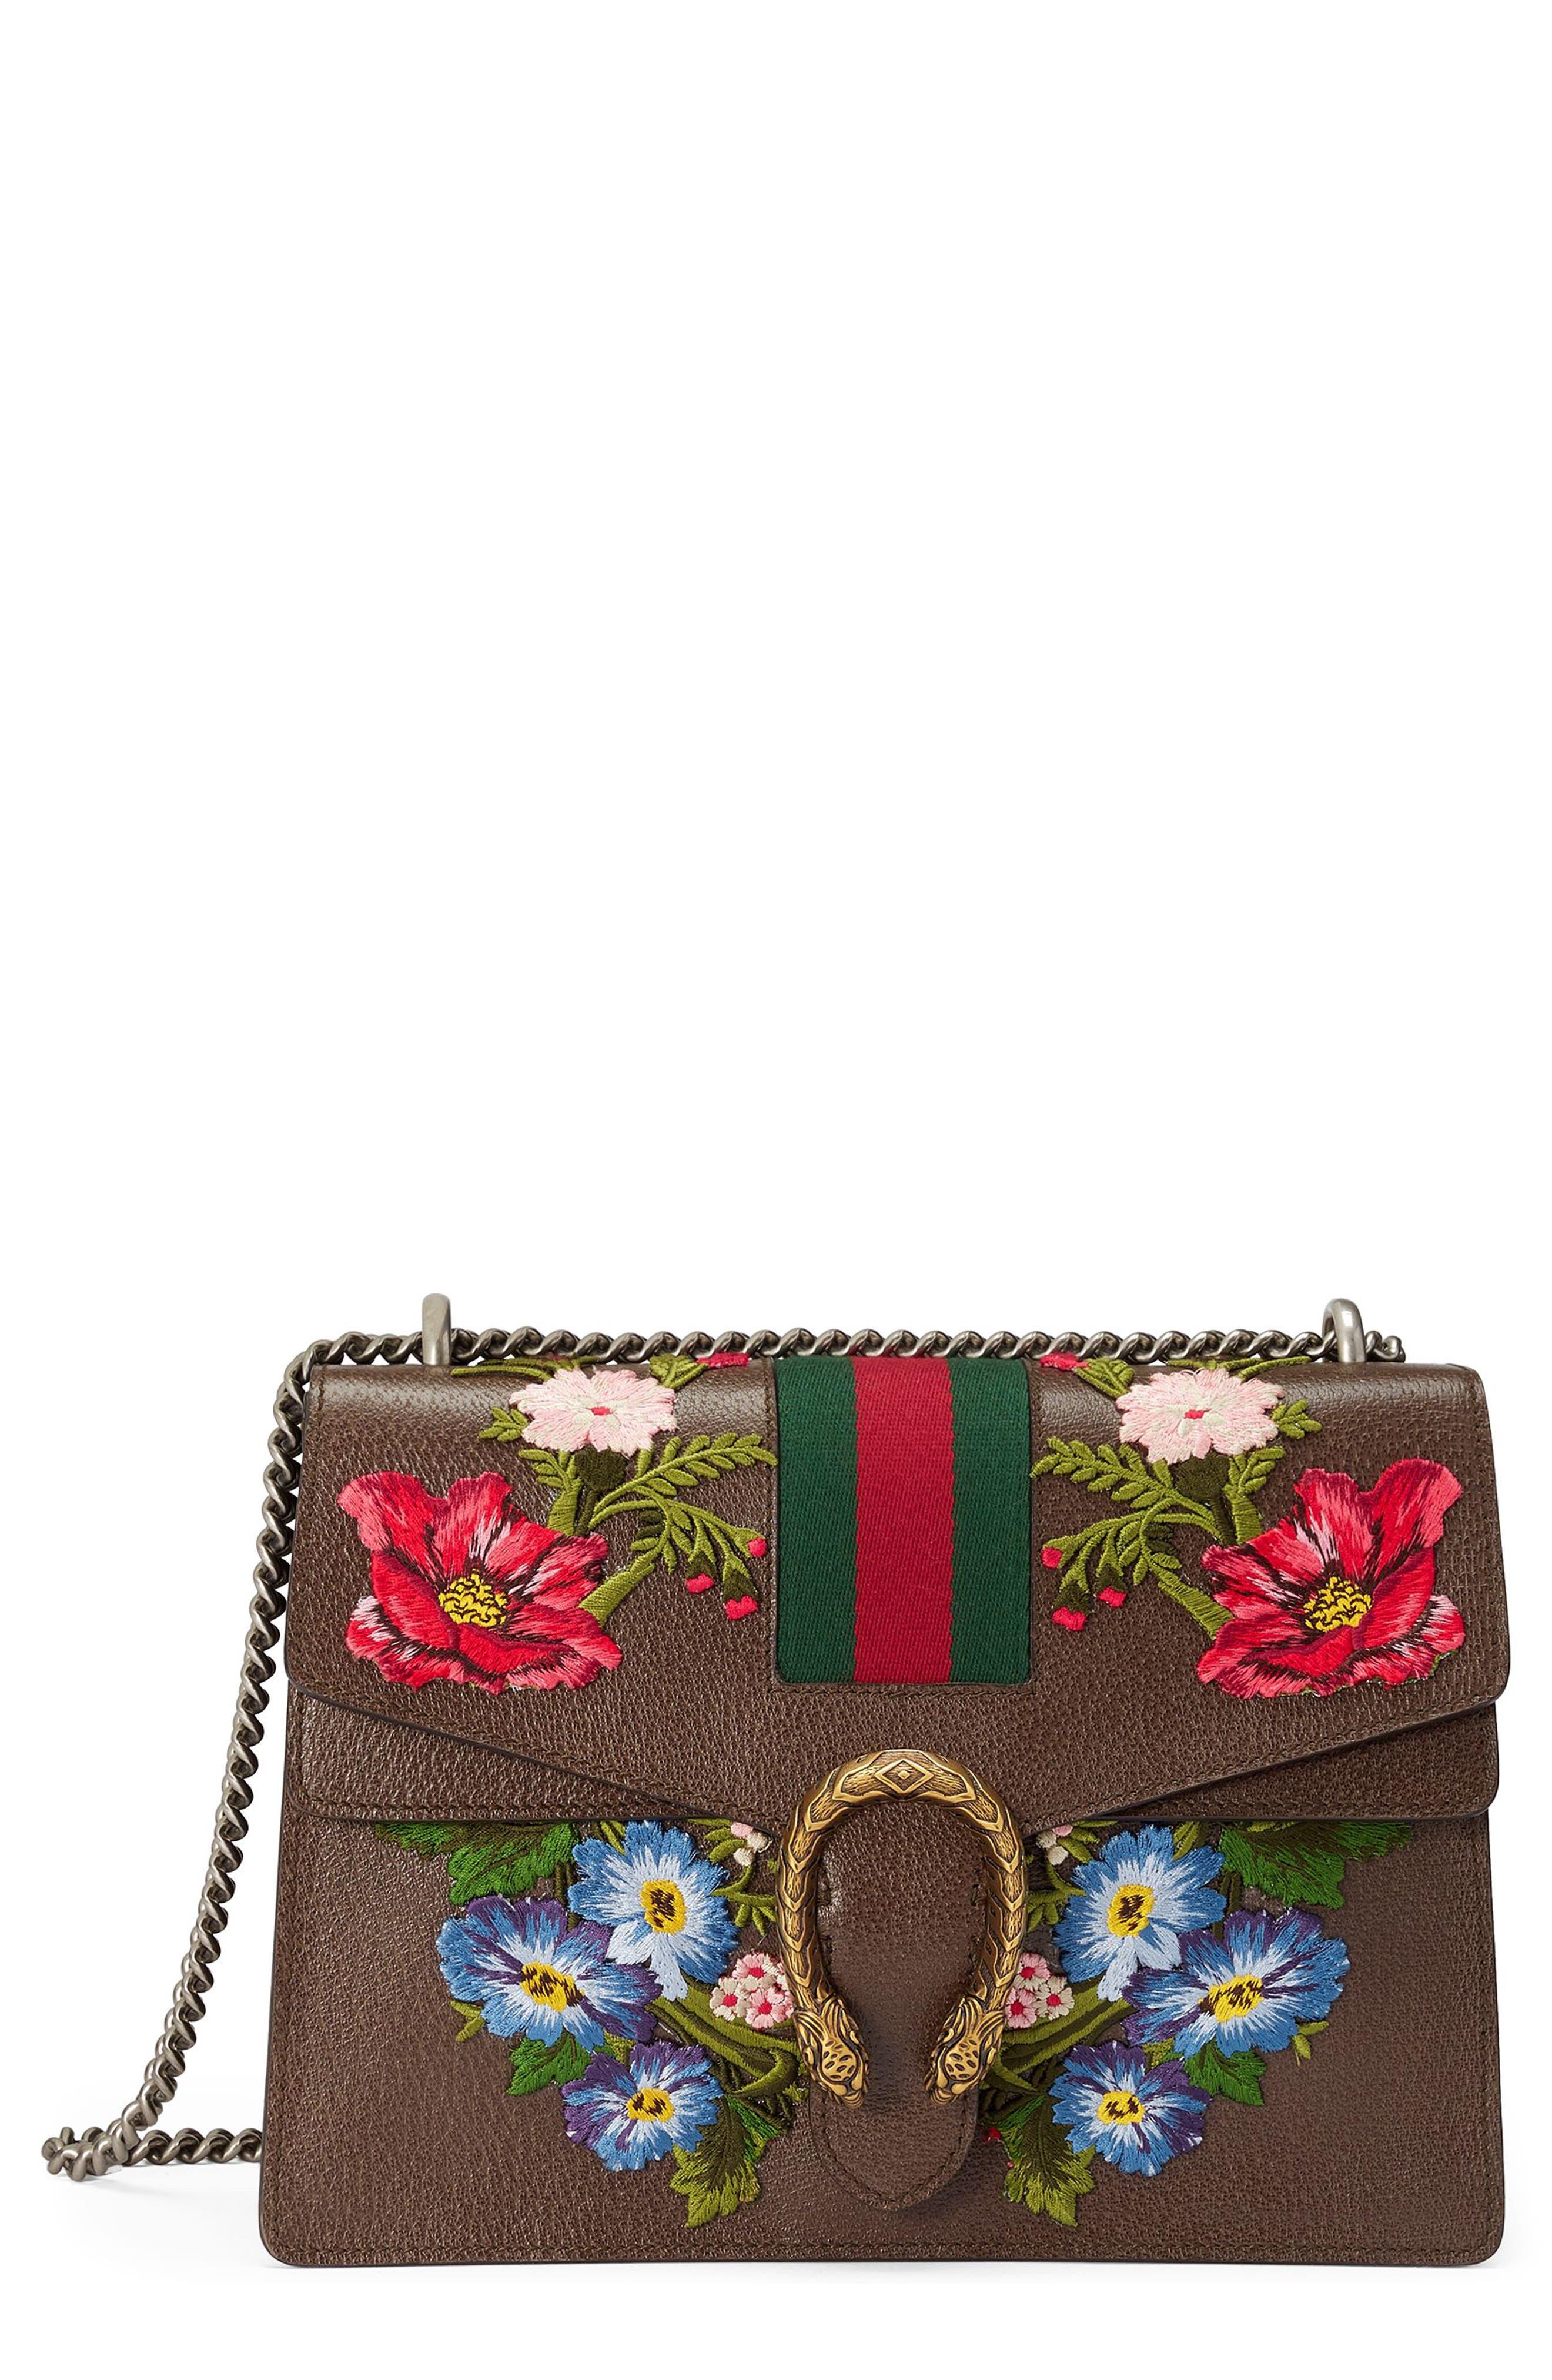 Medium Dionysus Embroidered Leather Shoulder Bag,                         Main,                         color, NEW ACERO/ MULTI